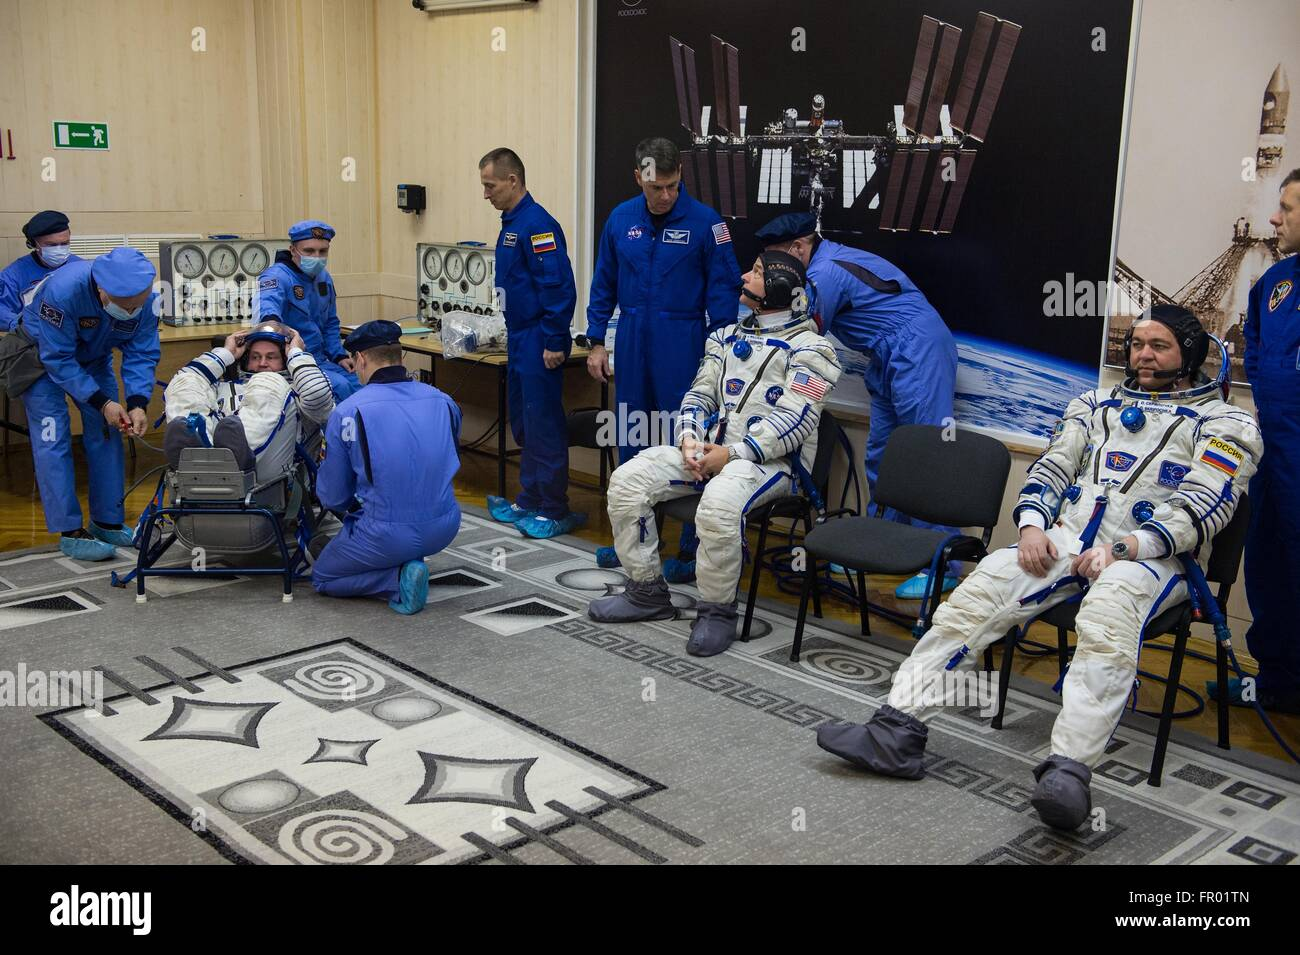 Baikonur, Kazakhstan. 19th Mar, 2016. International Space Station Expedition 47 crew members Russian cosmonaut Alexey - Stock Image